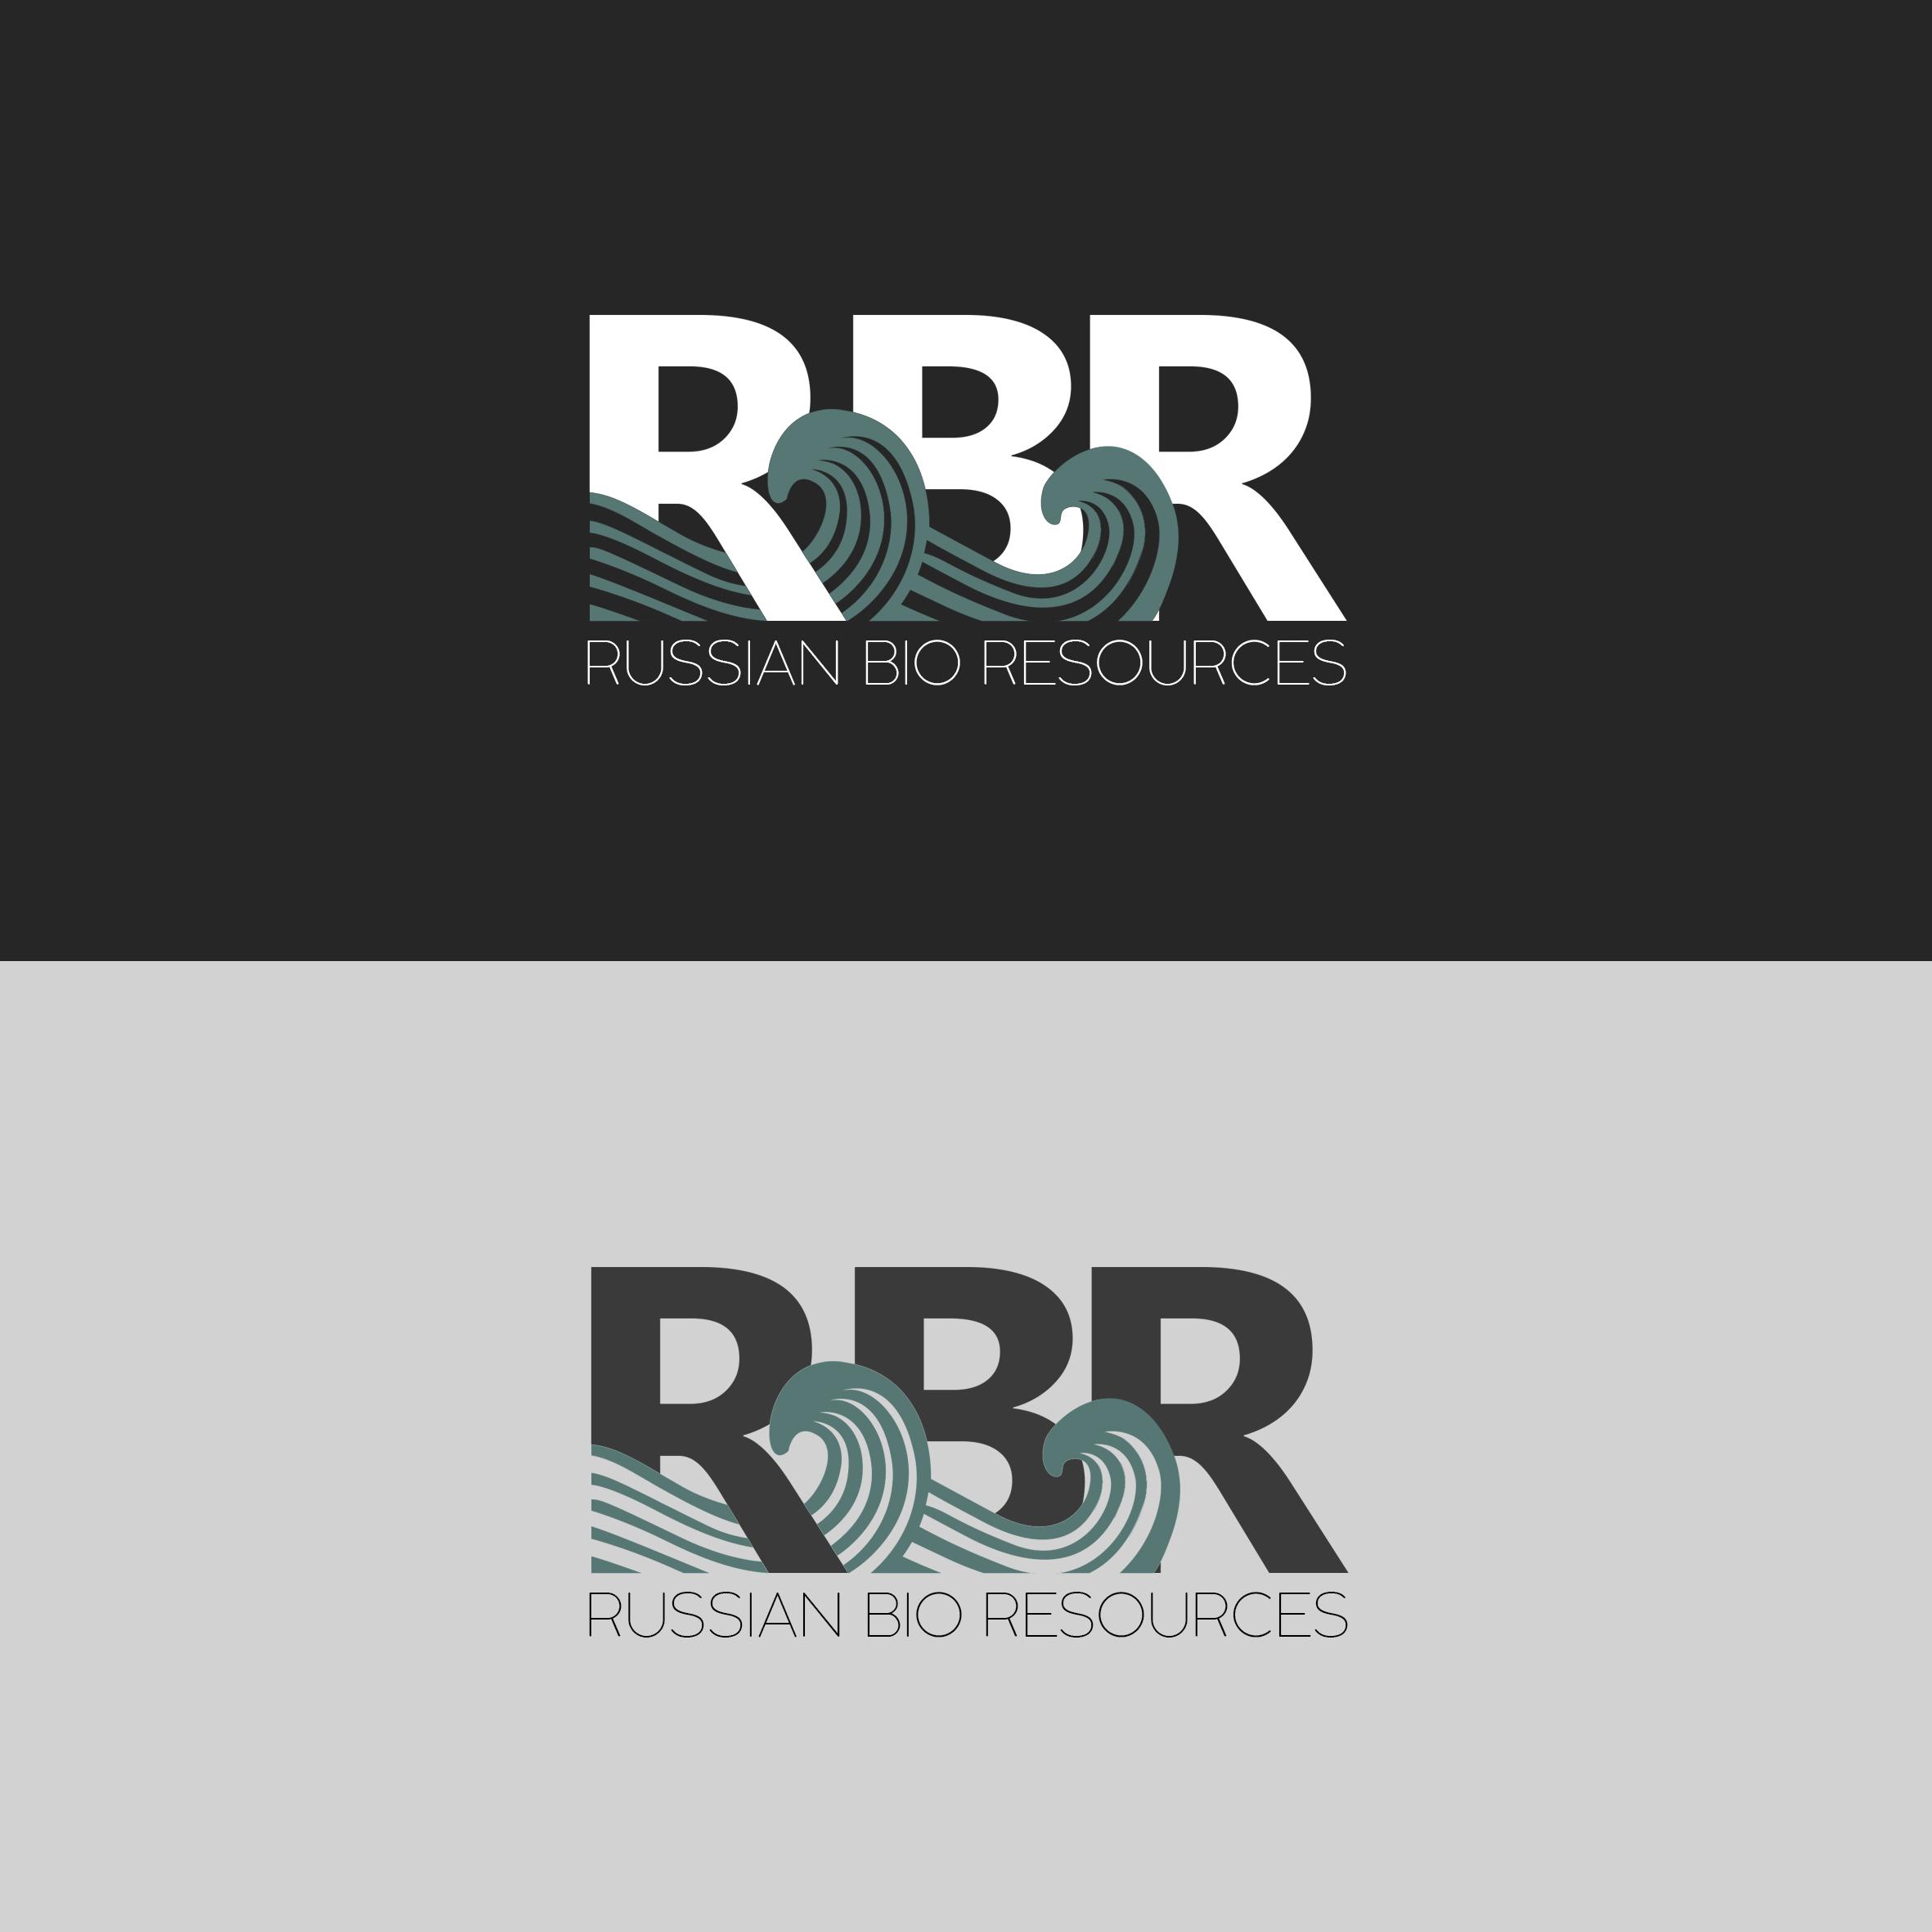 Разработка логотипа для компании «Русские Био Ресурсы» фото f_90458fbf895c0a8b.jpg